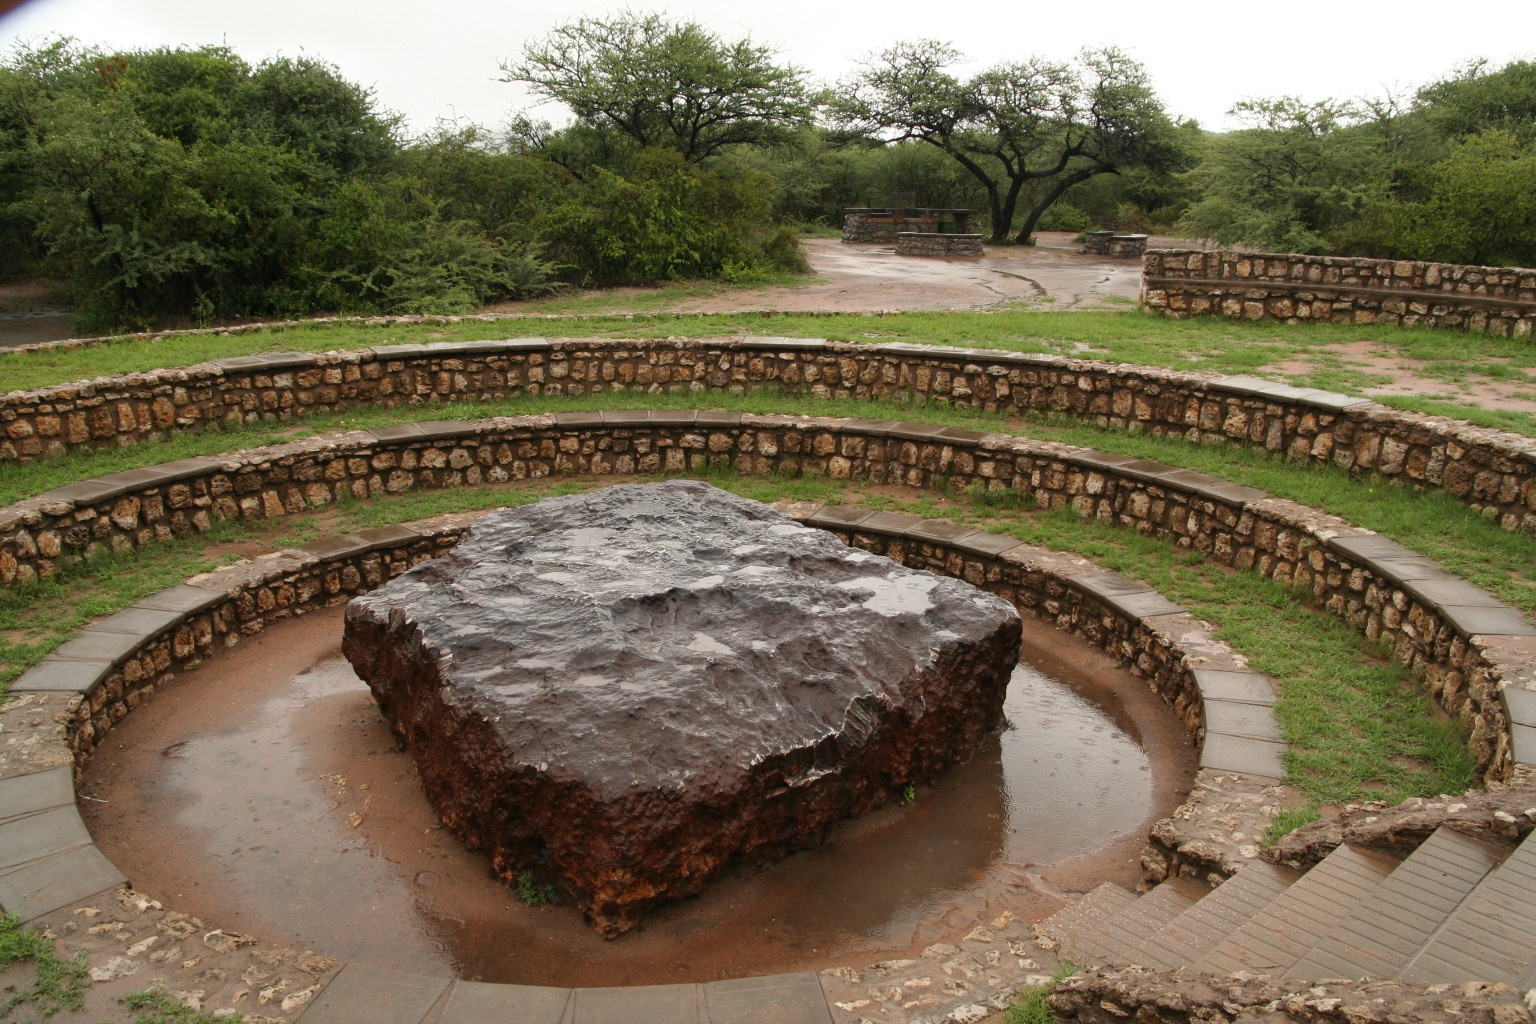 The biggest meteorite on Earth near Grootfontein